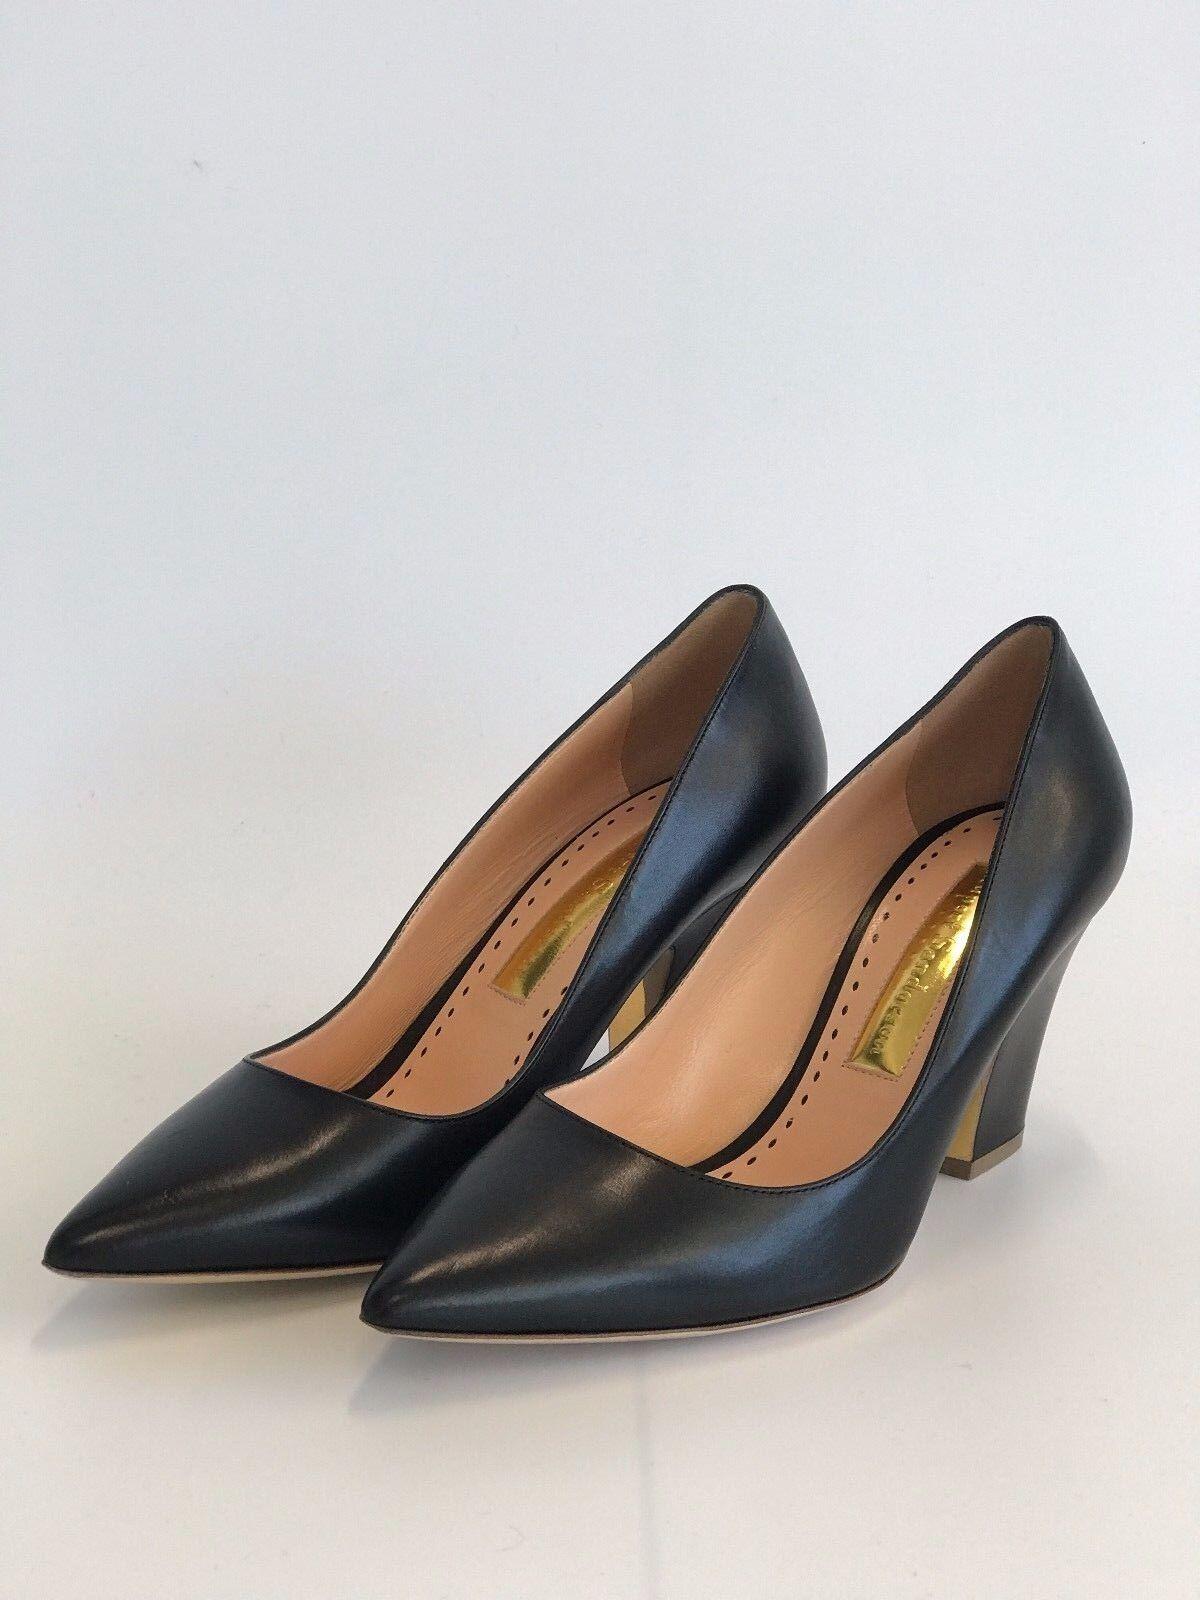 Rupert Sanderson London Pierrot Leather Pointed Toe  - Size 39